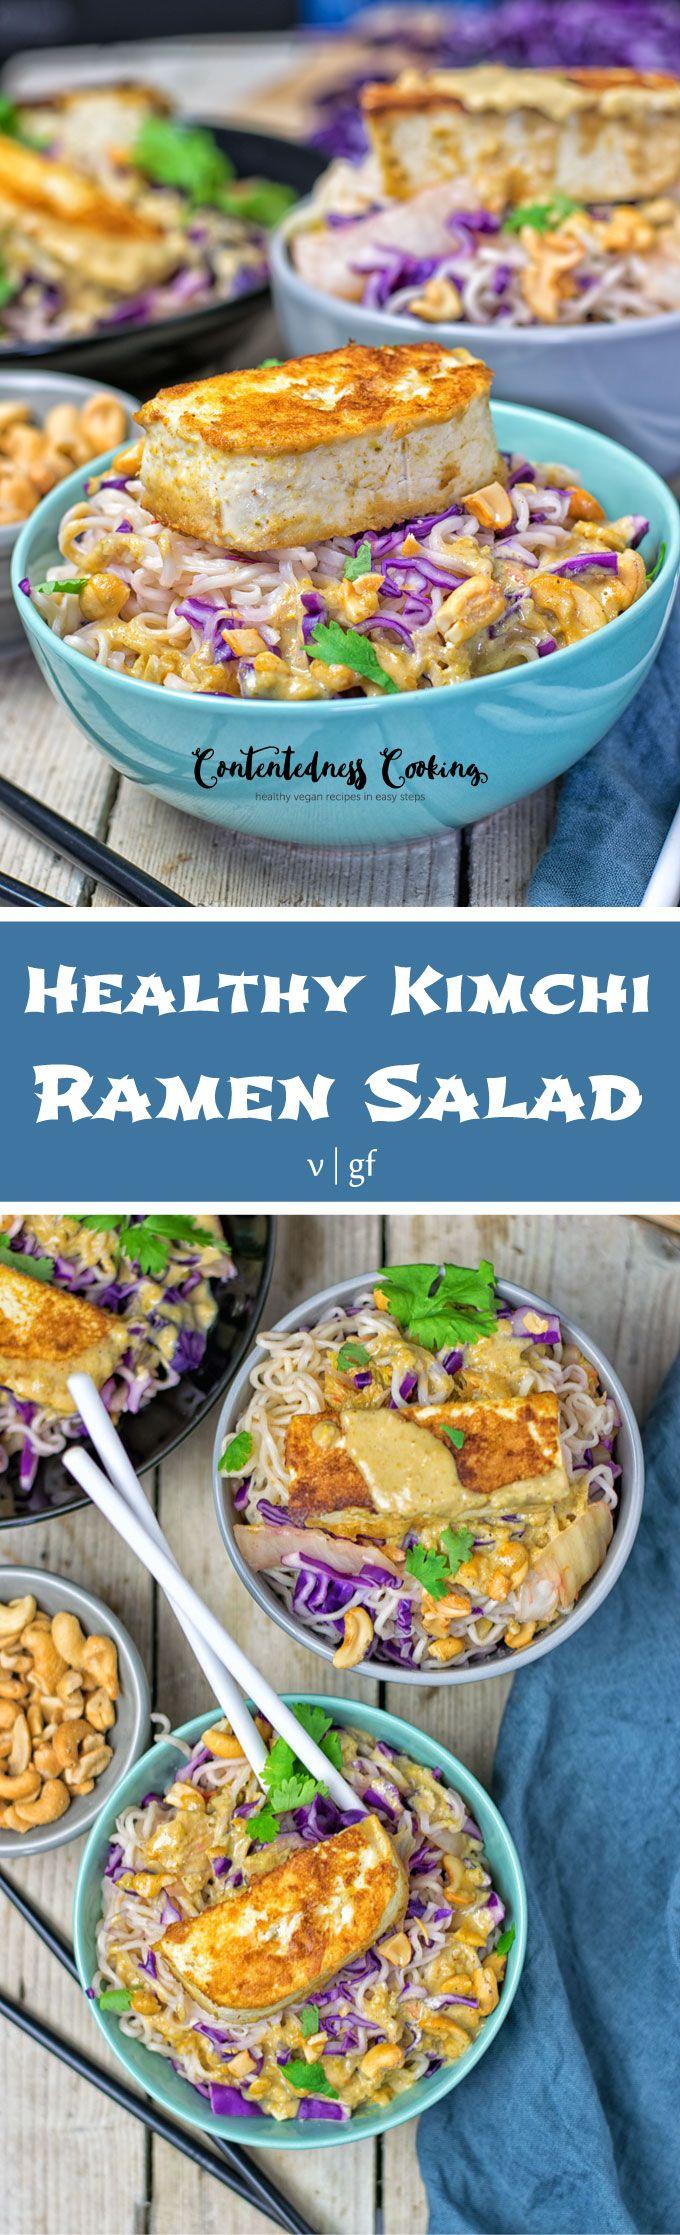 Healthy Kimchi Ramen Salad | #vegan #glutenfree www.contentednesscooking.com